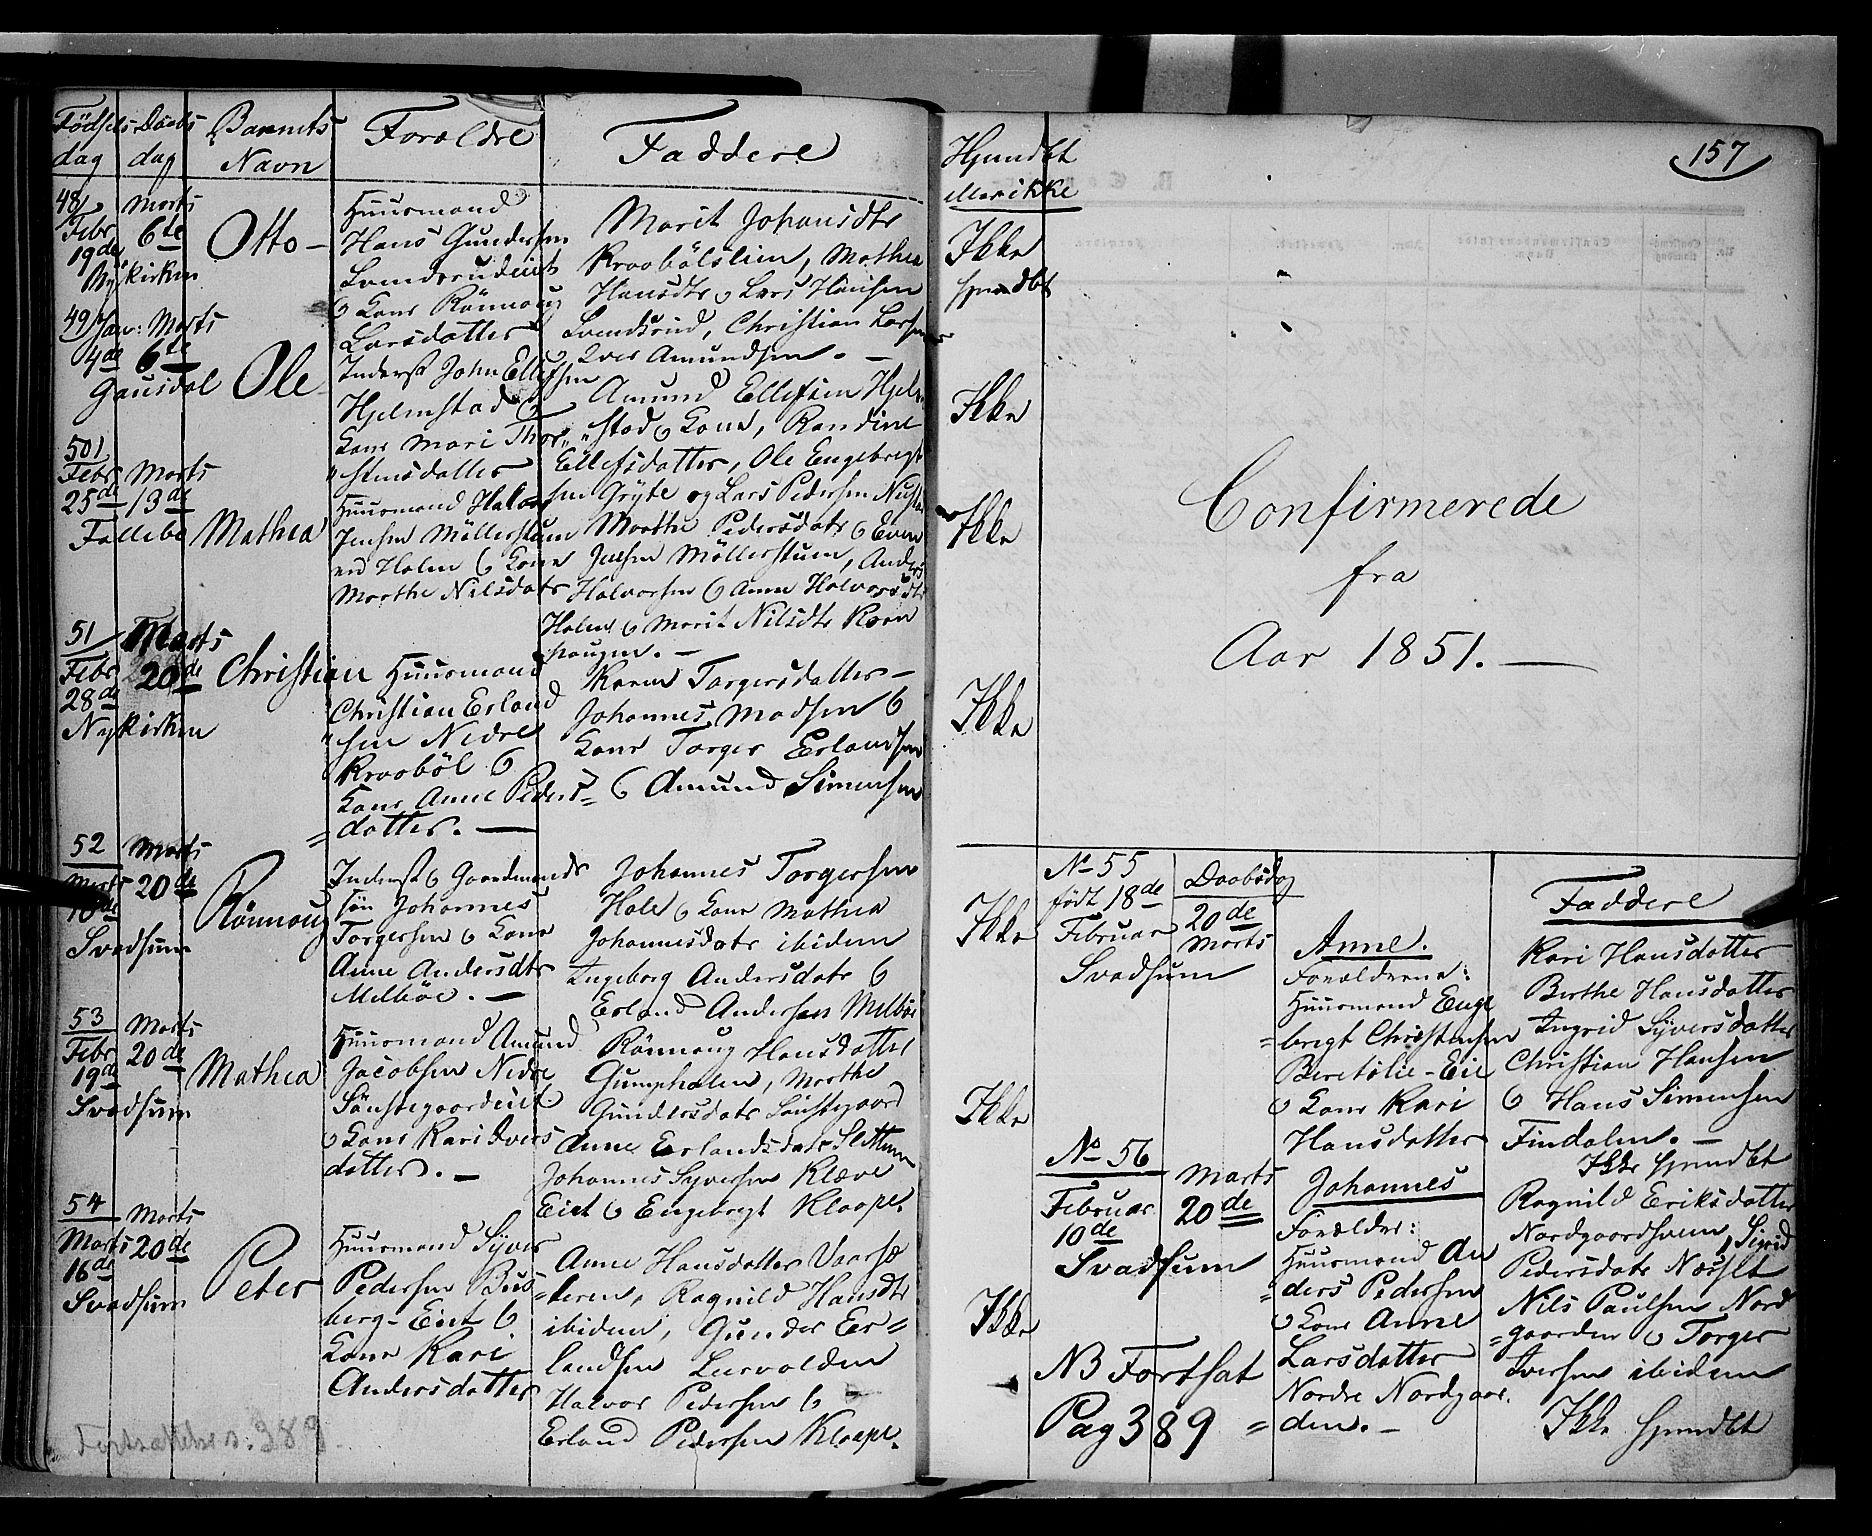 SAH, Gausdal prestekontor, Ministerialbok nr. 8, 1850-1861, s. 157